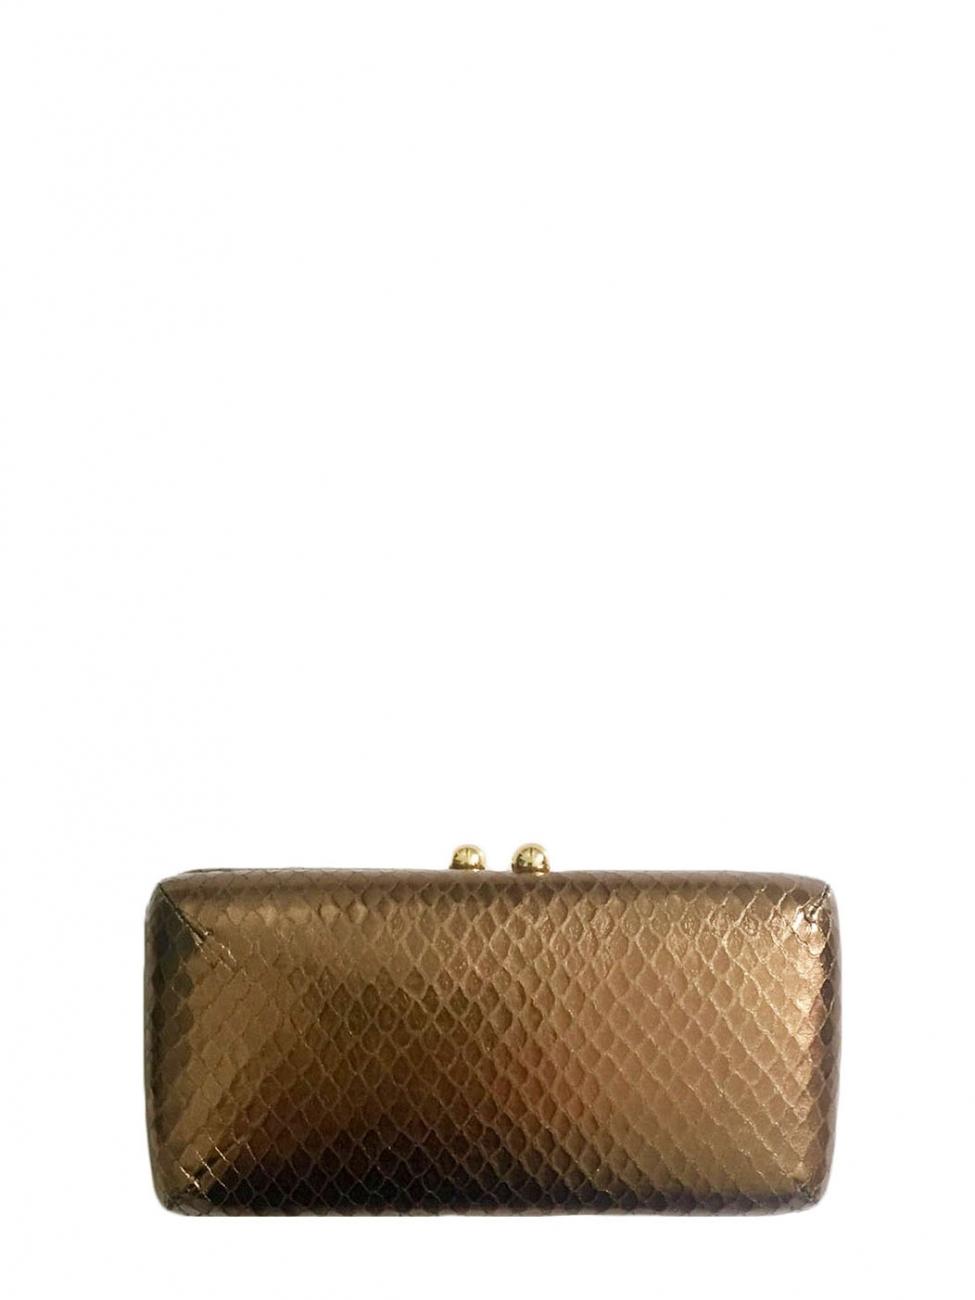 4439e6241e Louise Paris - HALSTON HERITAGE Gold snakeskin embossed leather evening  minaudière clutch Retail price €270